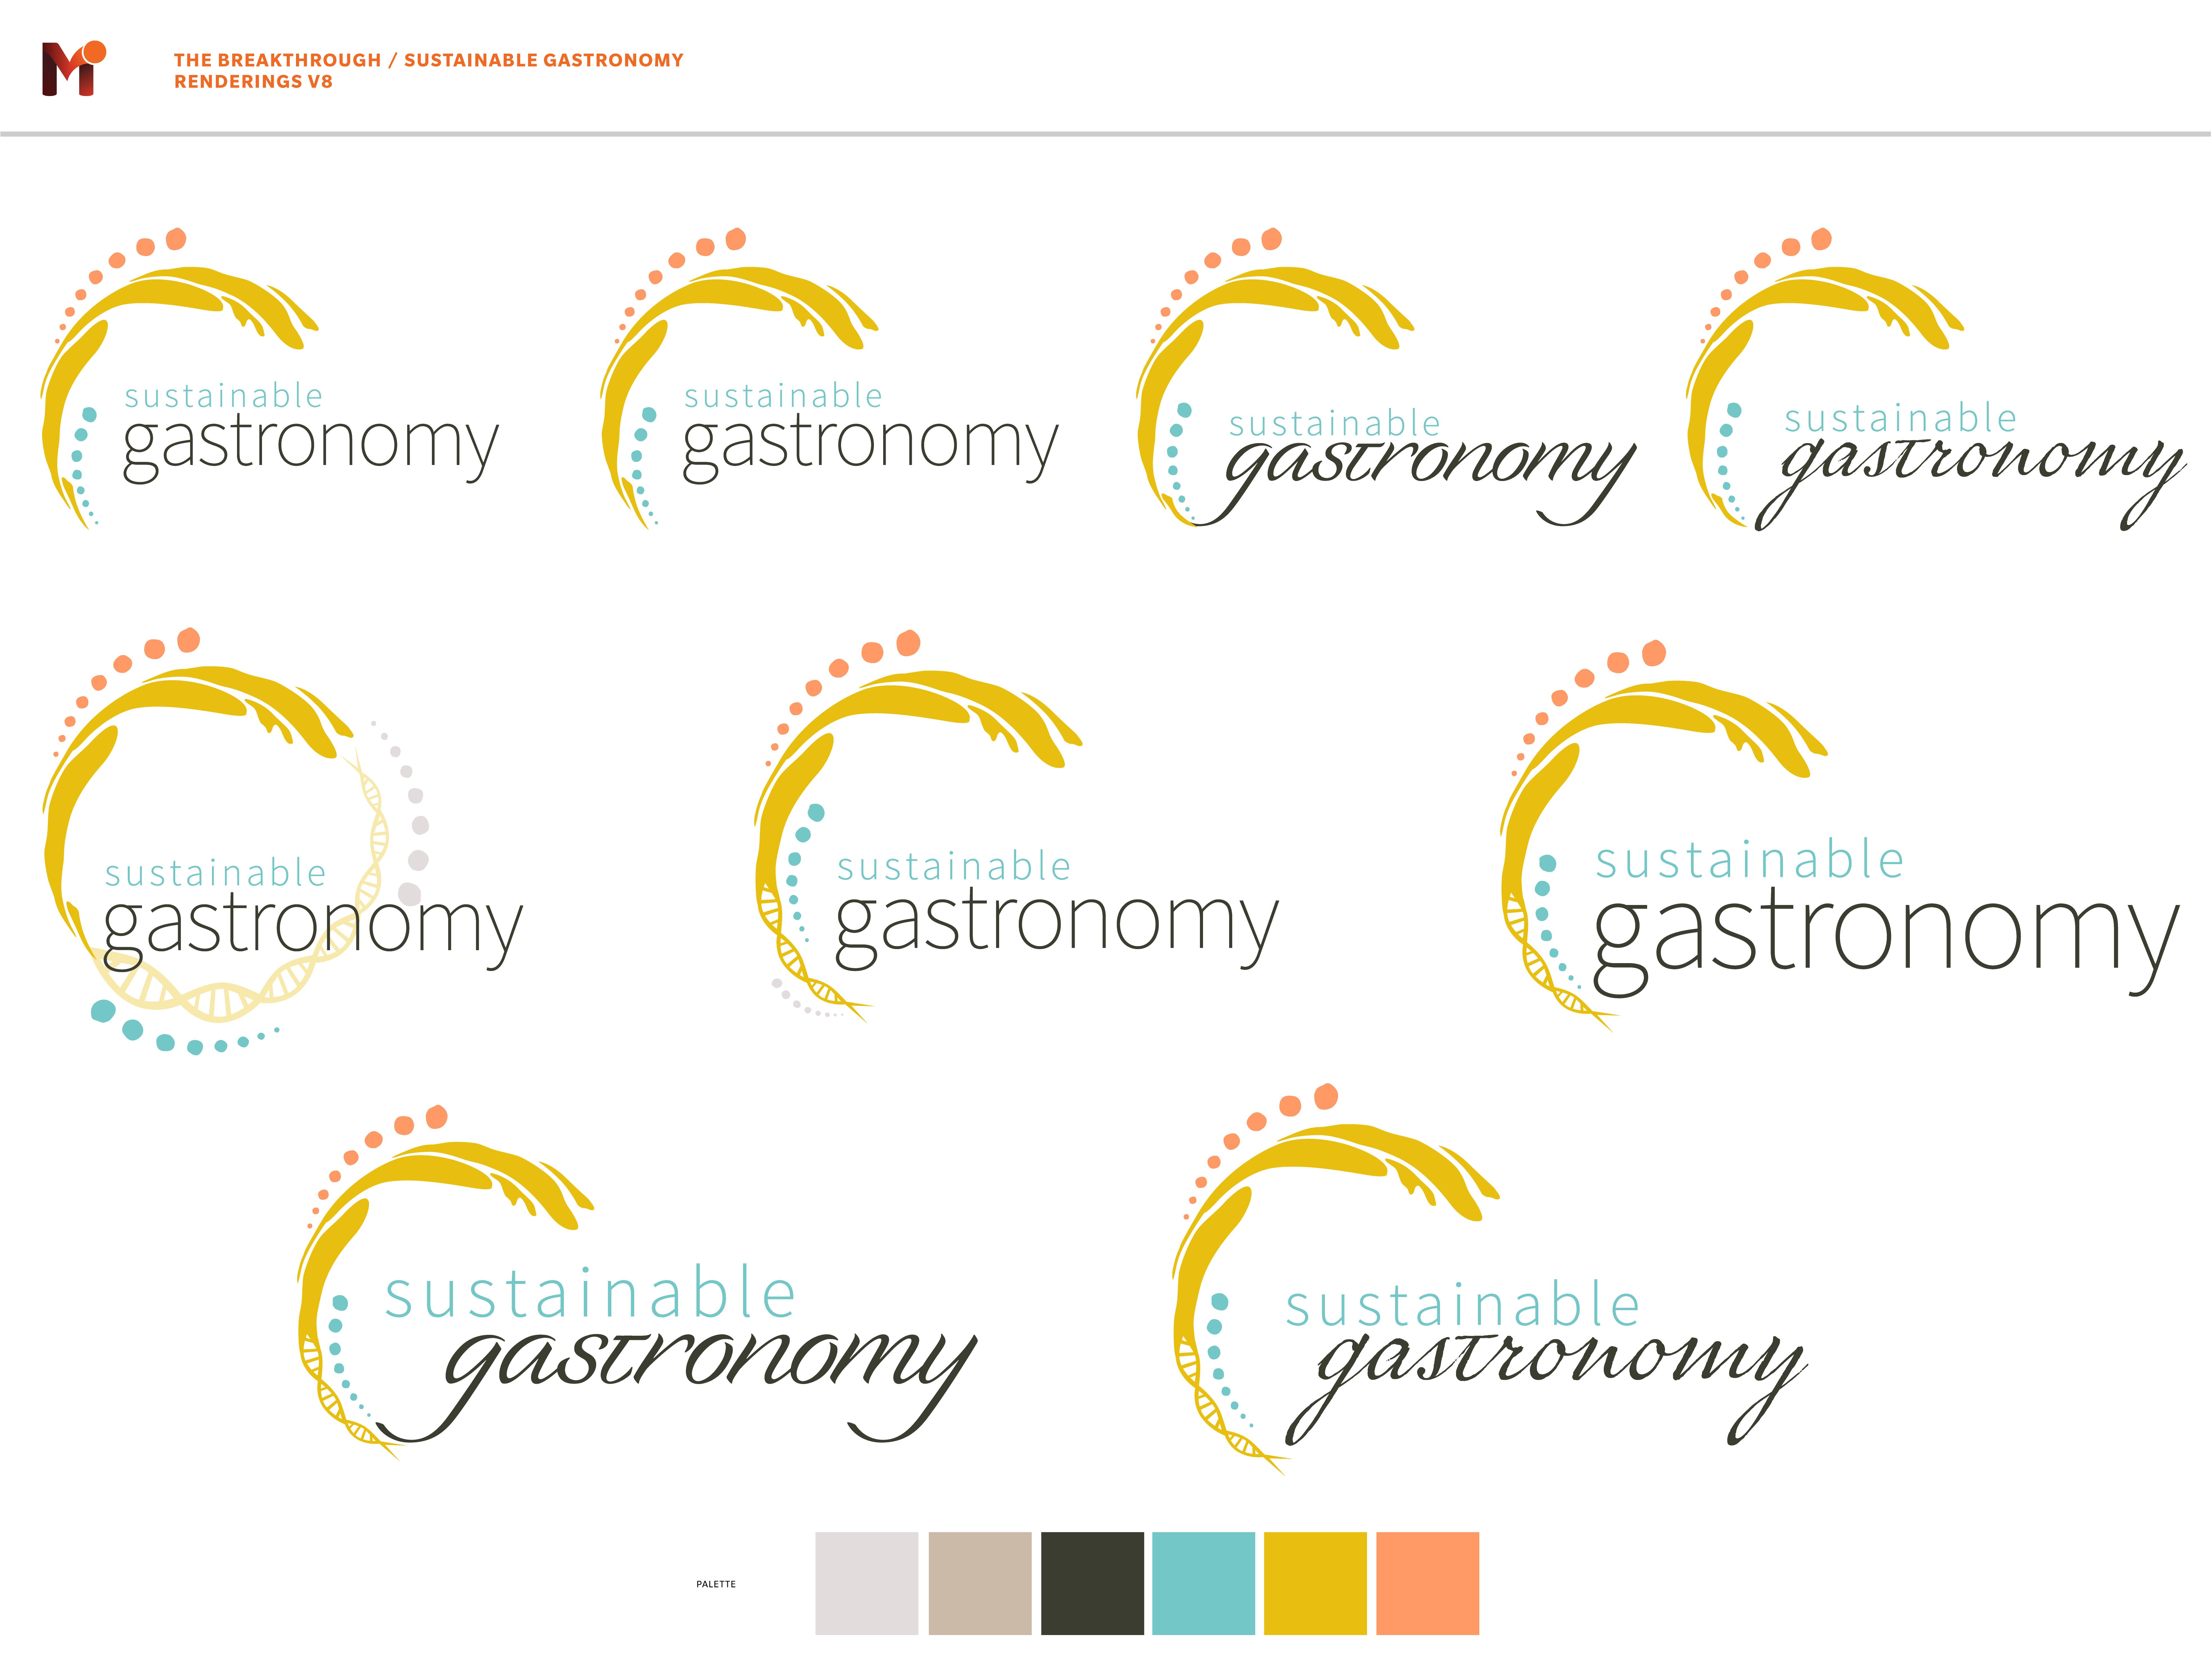 rendered-logos-v8-2